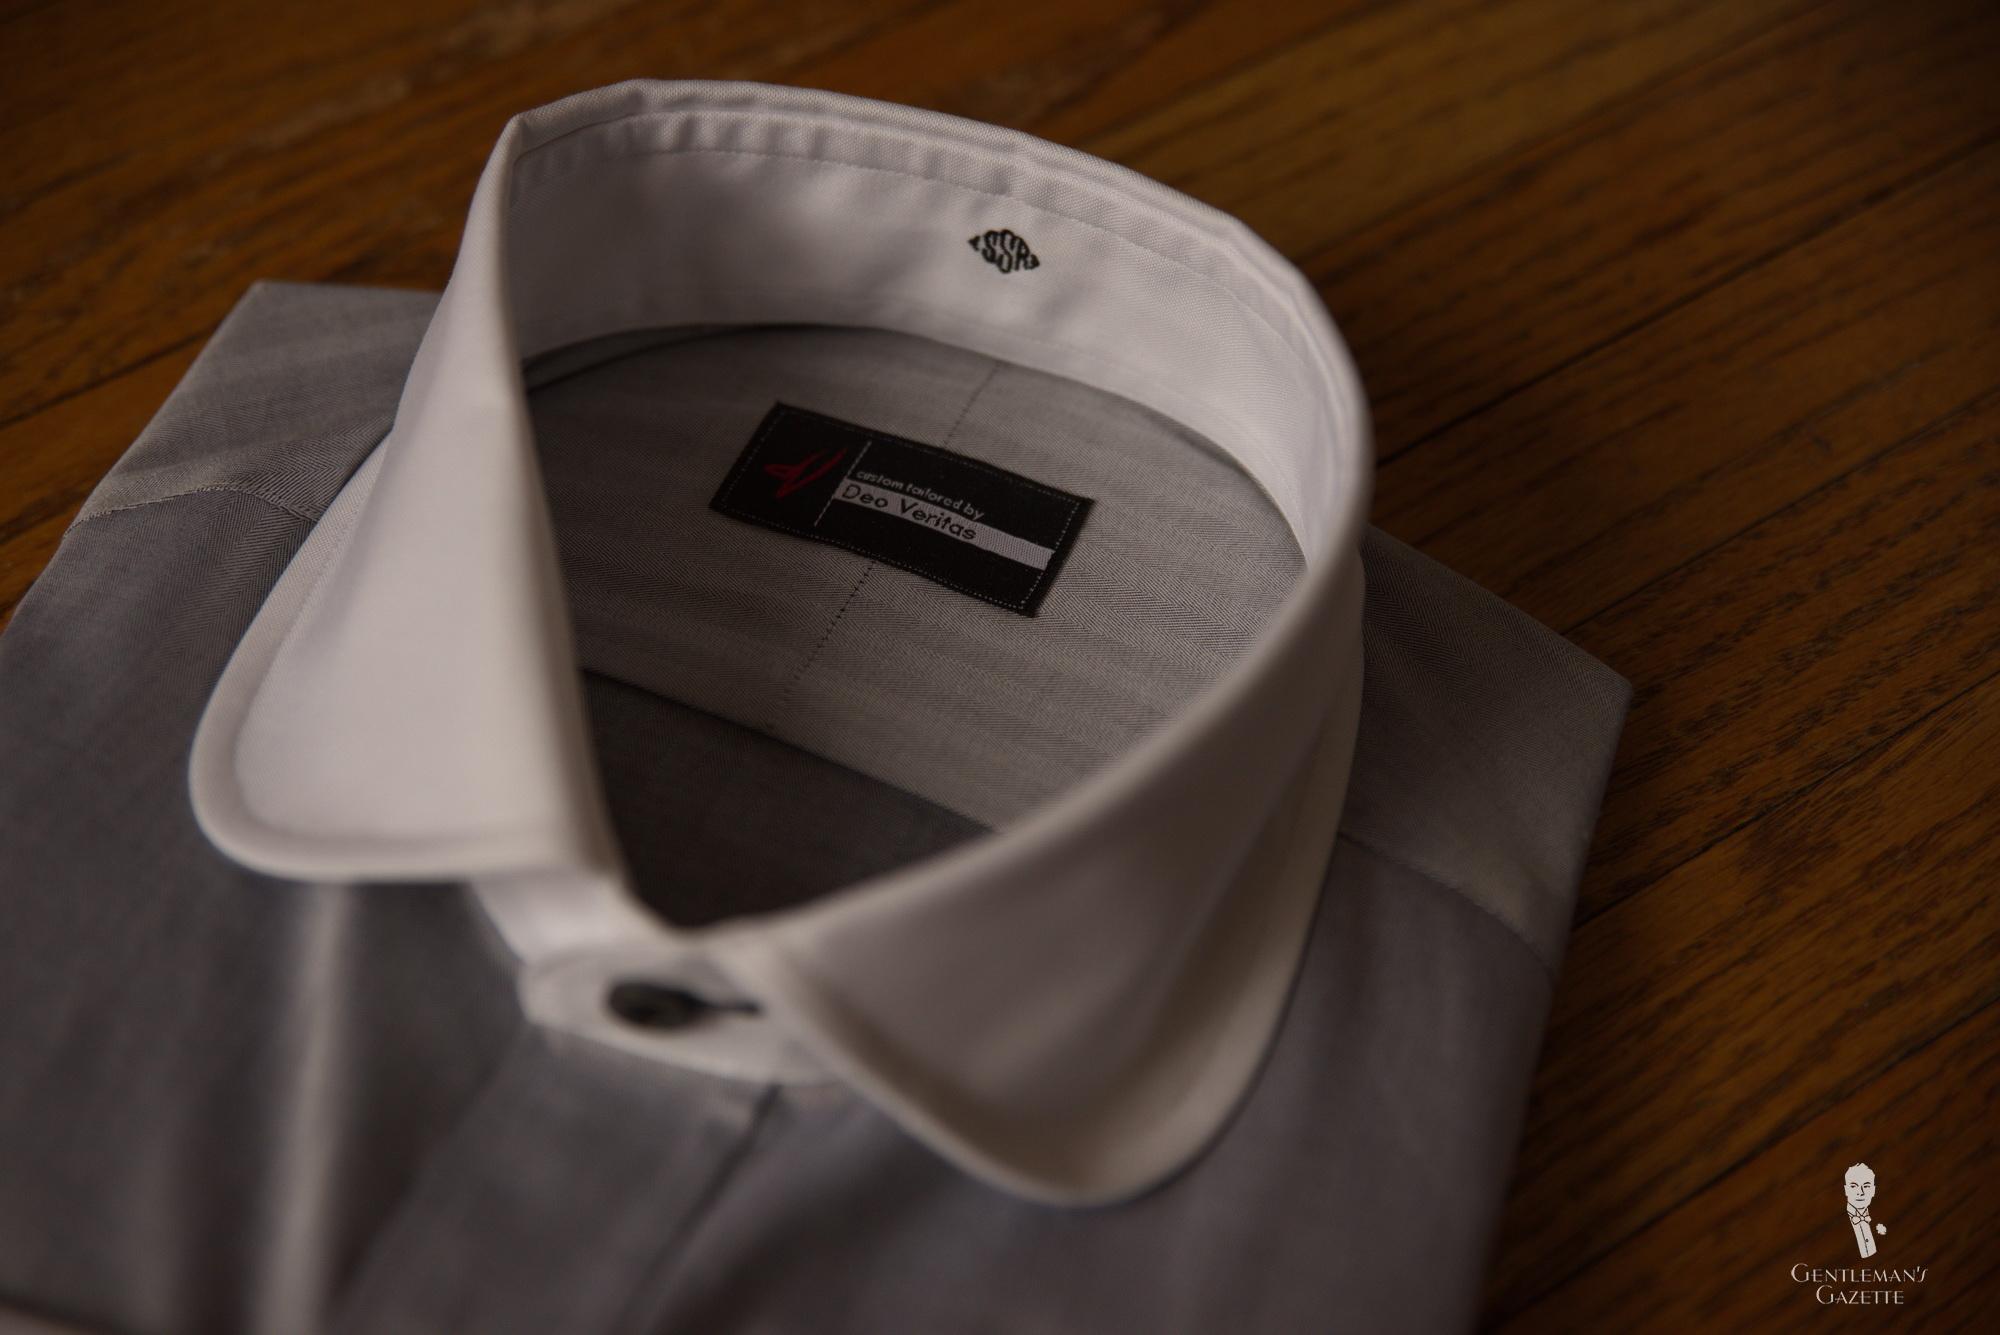 deo veritas dress shirt review  u2014 gentleman u0026 39 s gazette